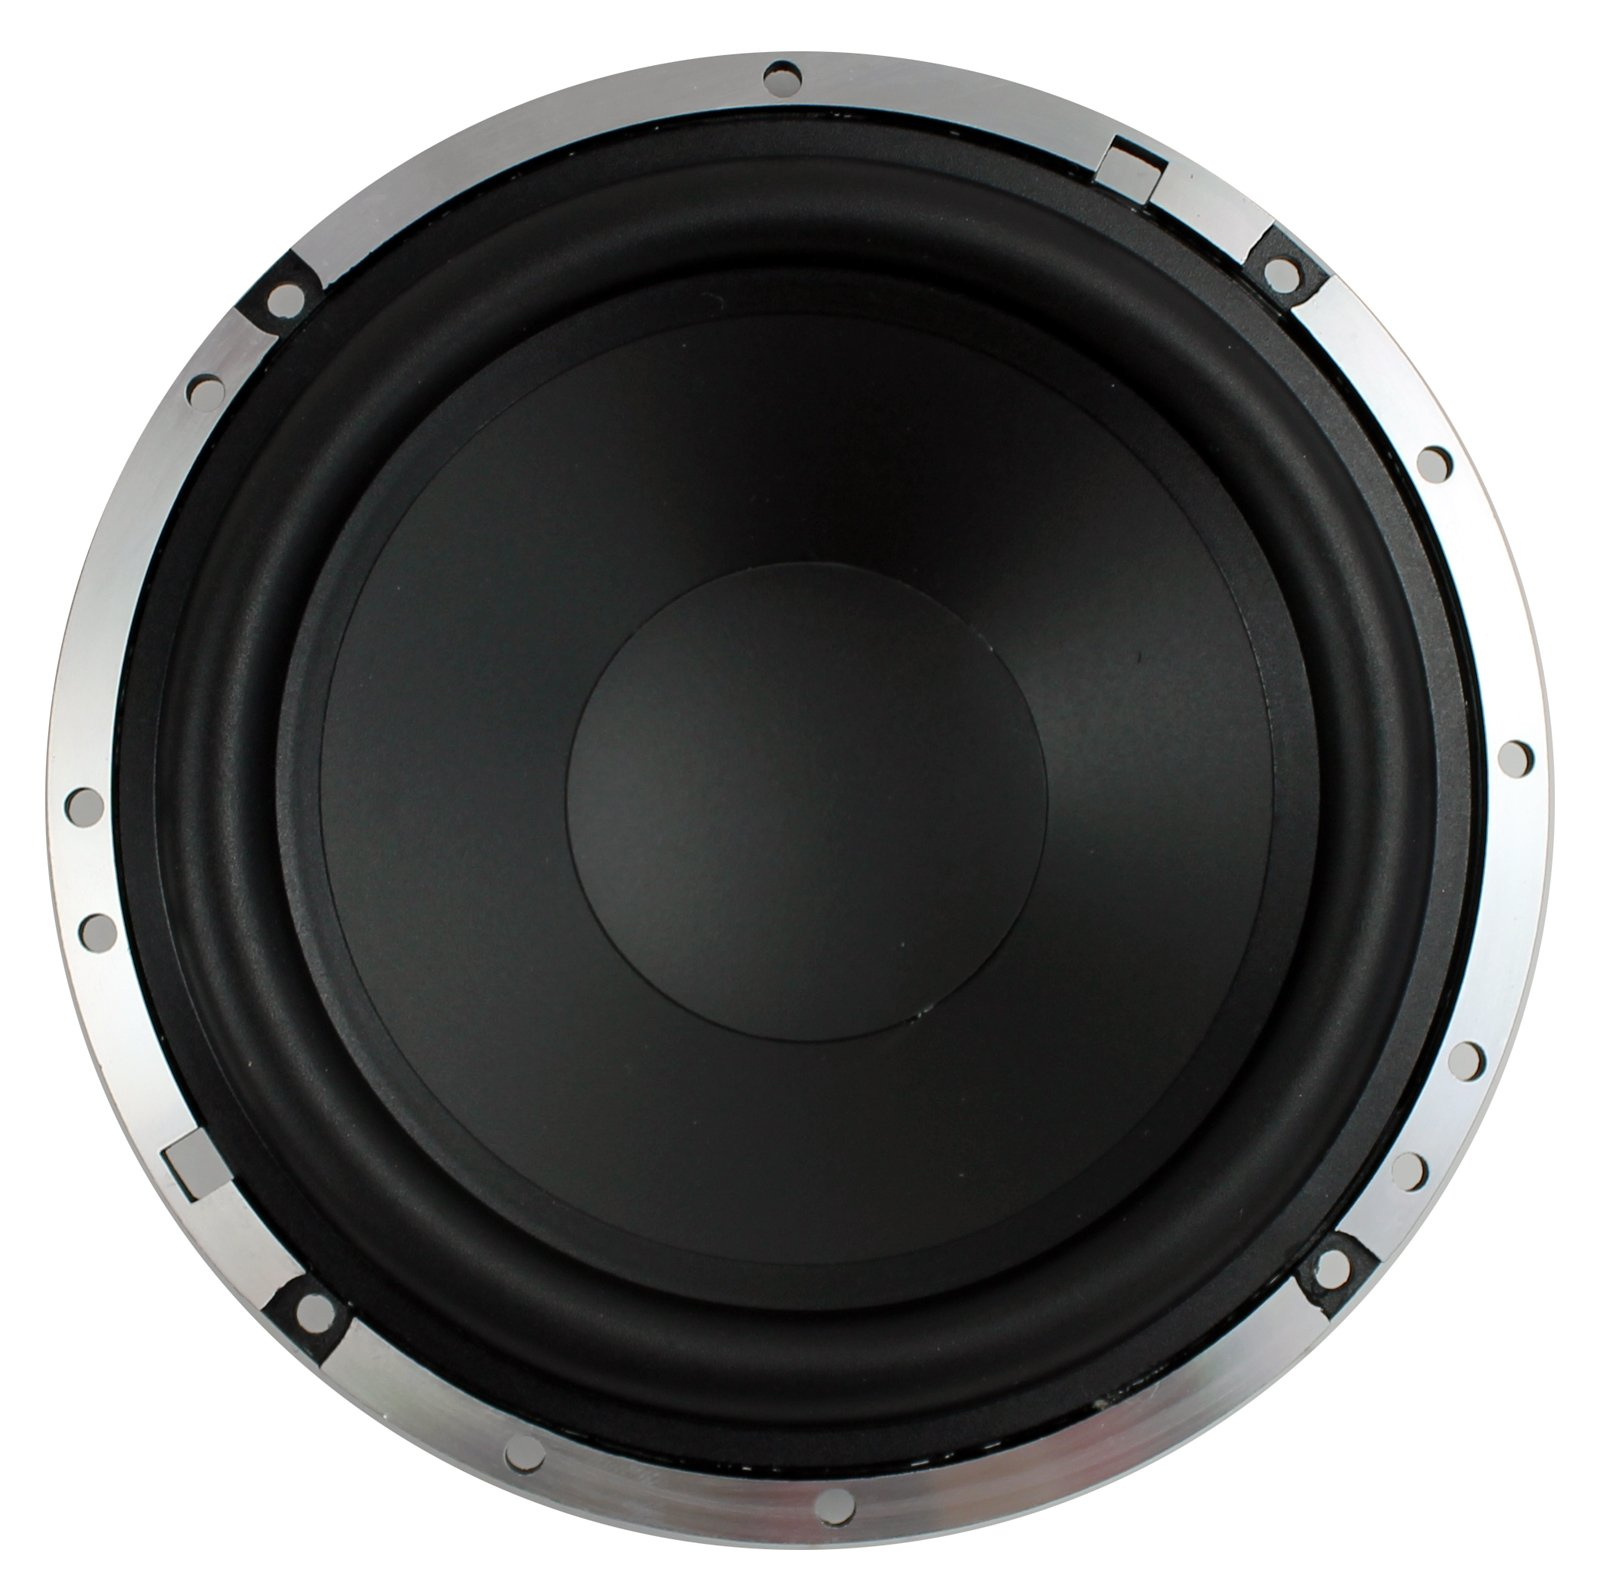 BOSPC652C - Boss Audio 6.5 PHNTM COMP SPKR WITH by BOSS Audio (Image #3)